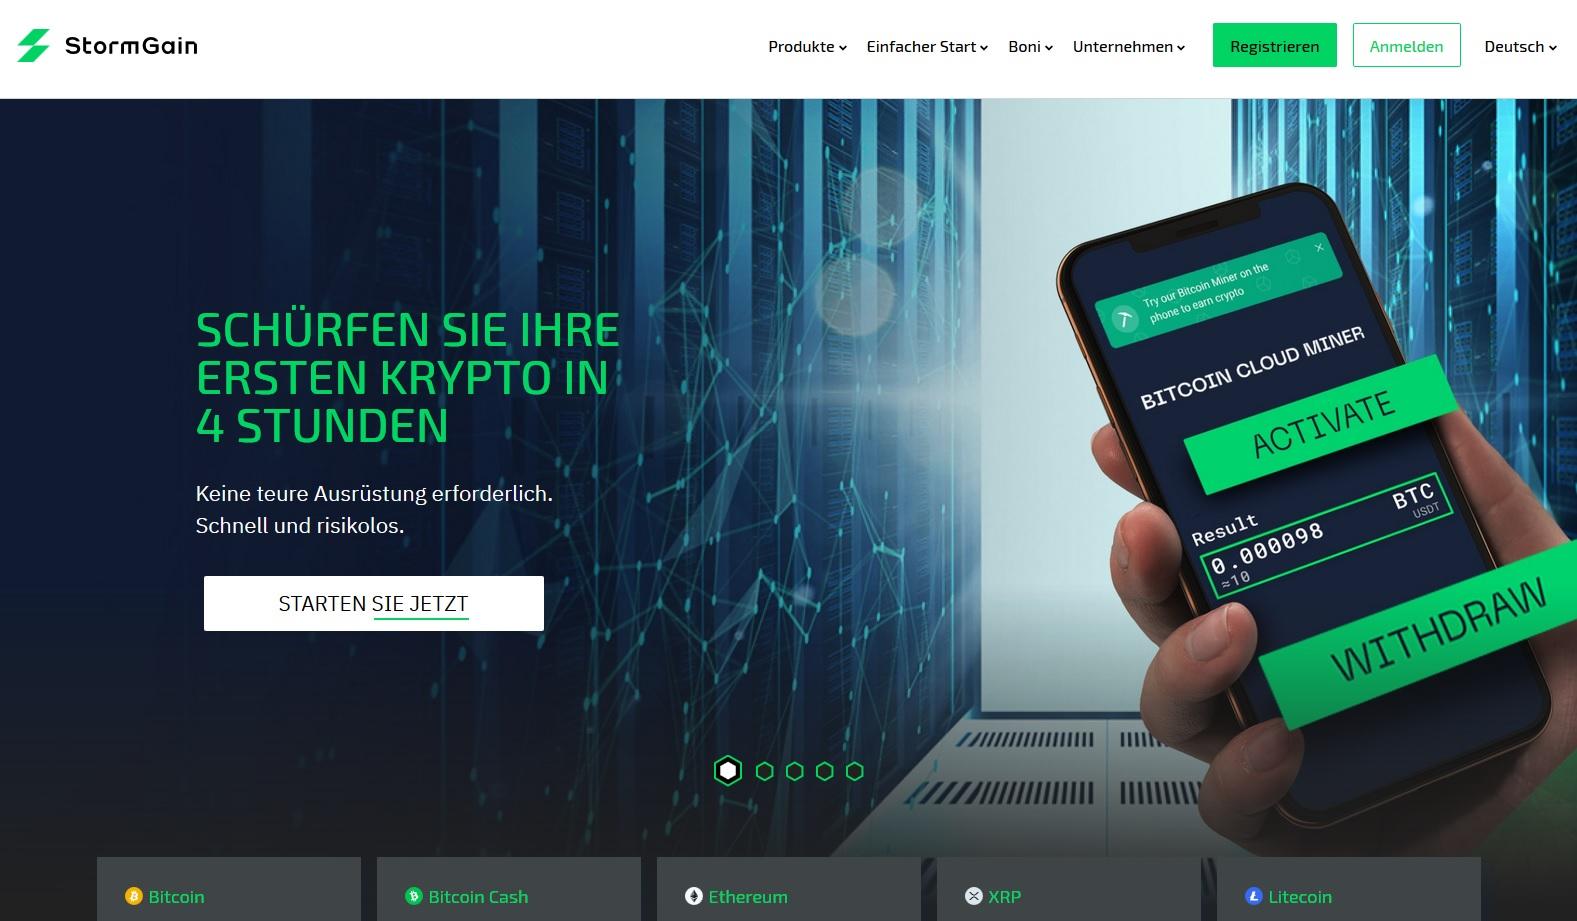 Bitcoin-Mining am Smartphone in der StormGain-App